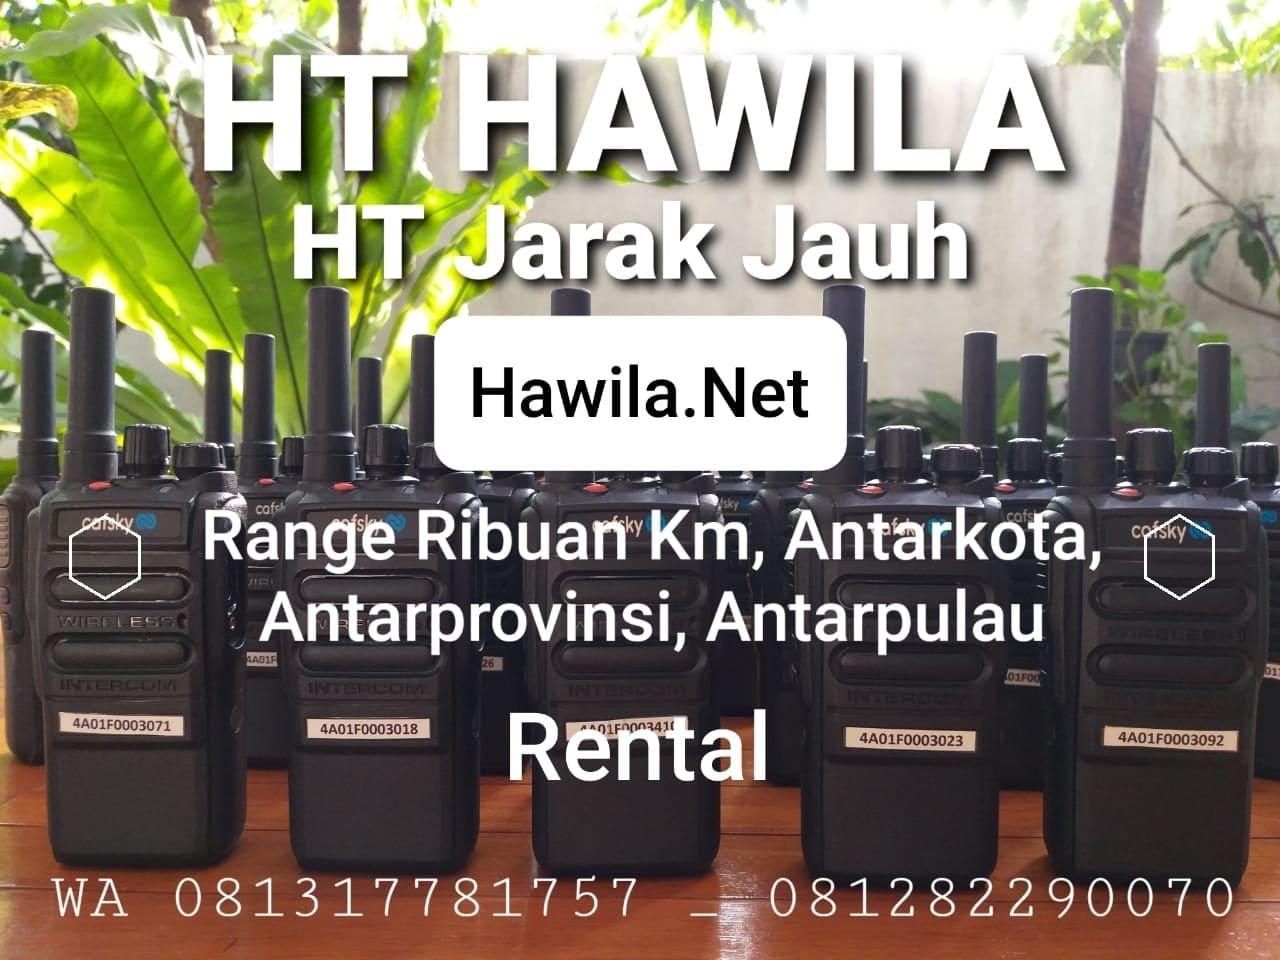 HT Hawila HT Jarak Jauh, Cafsky Radio